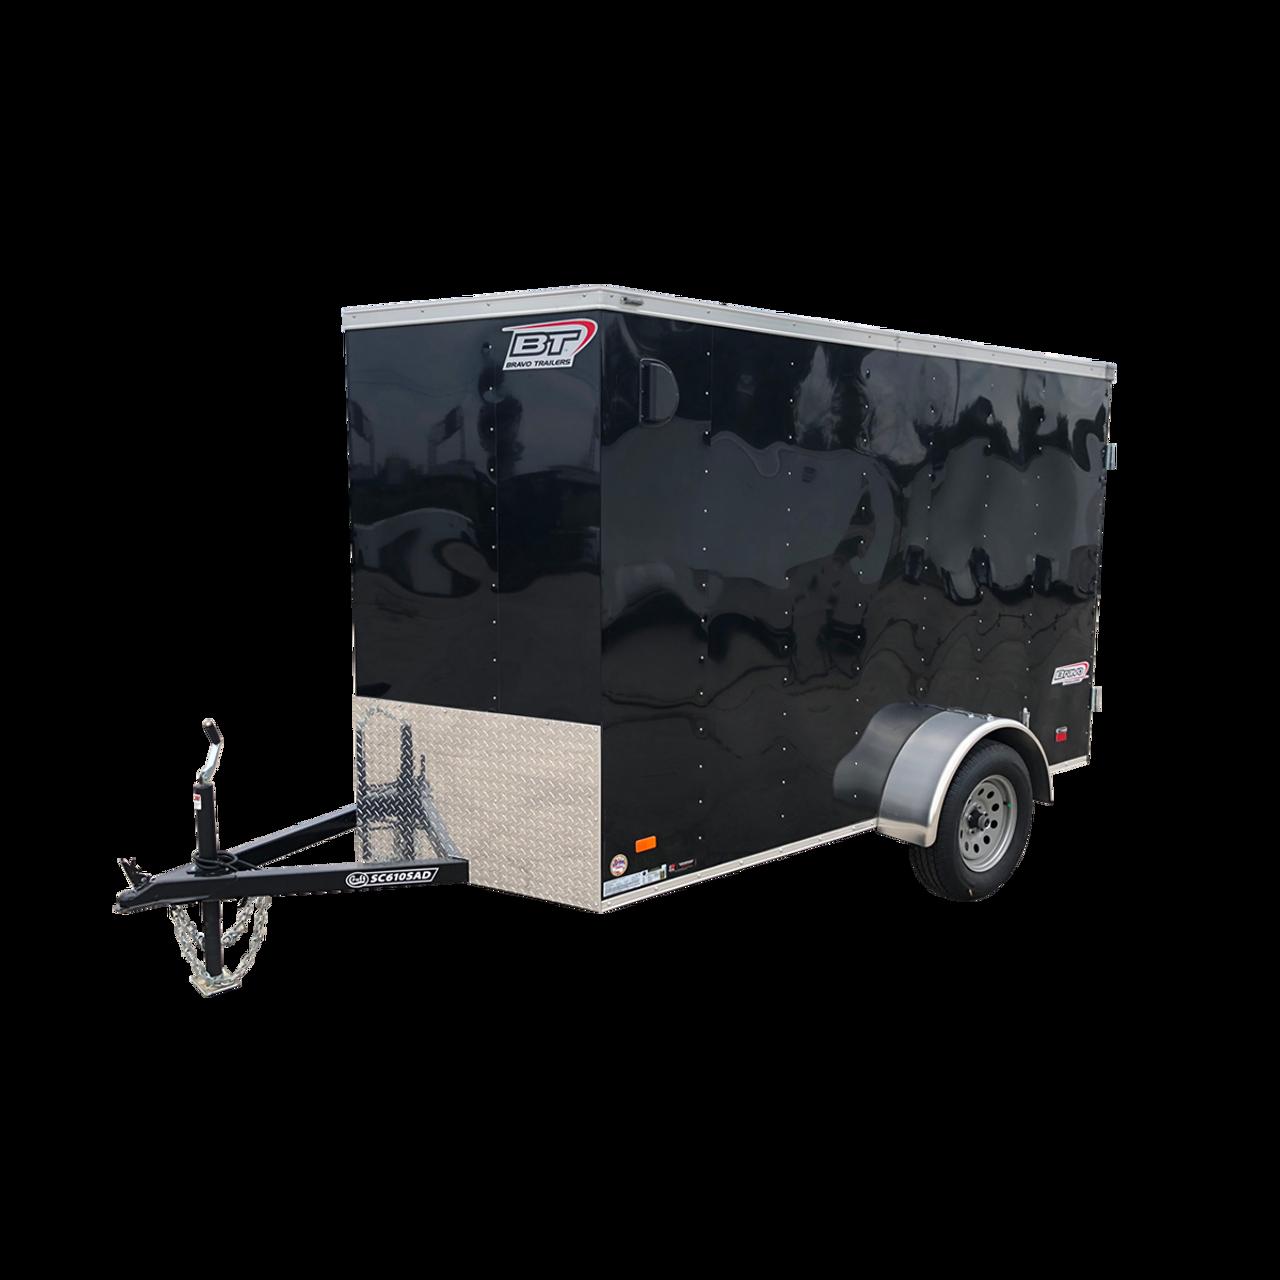 SC610SADGT --- 6' X 10' Enclosed Trailer with Double Rear Doors - Torsion - Bravo